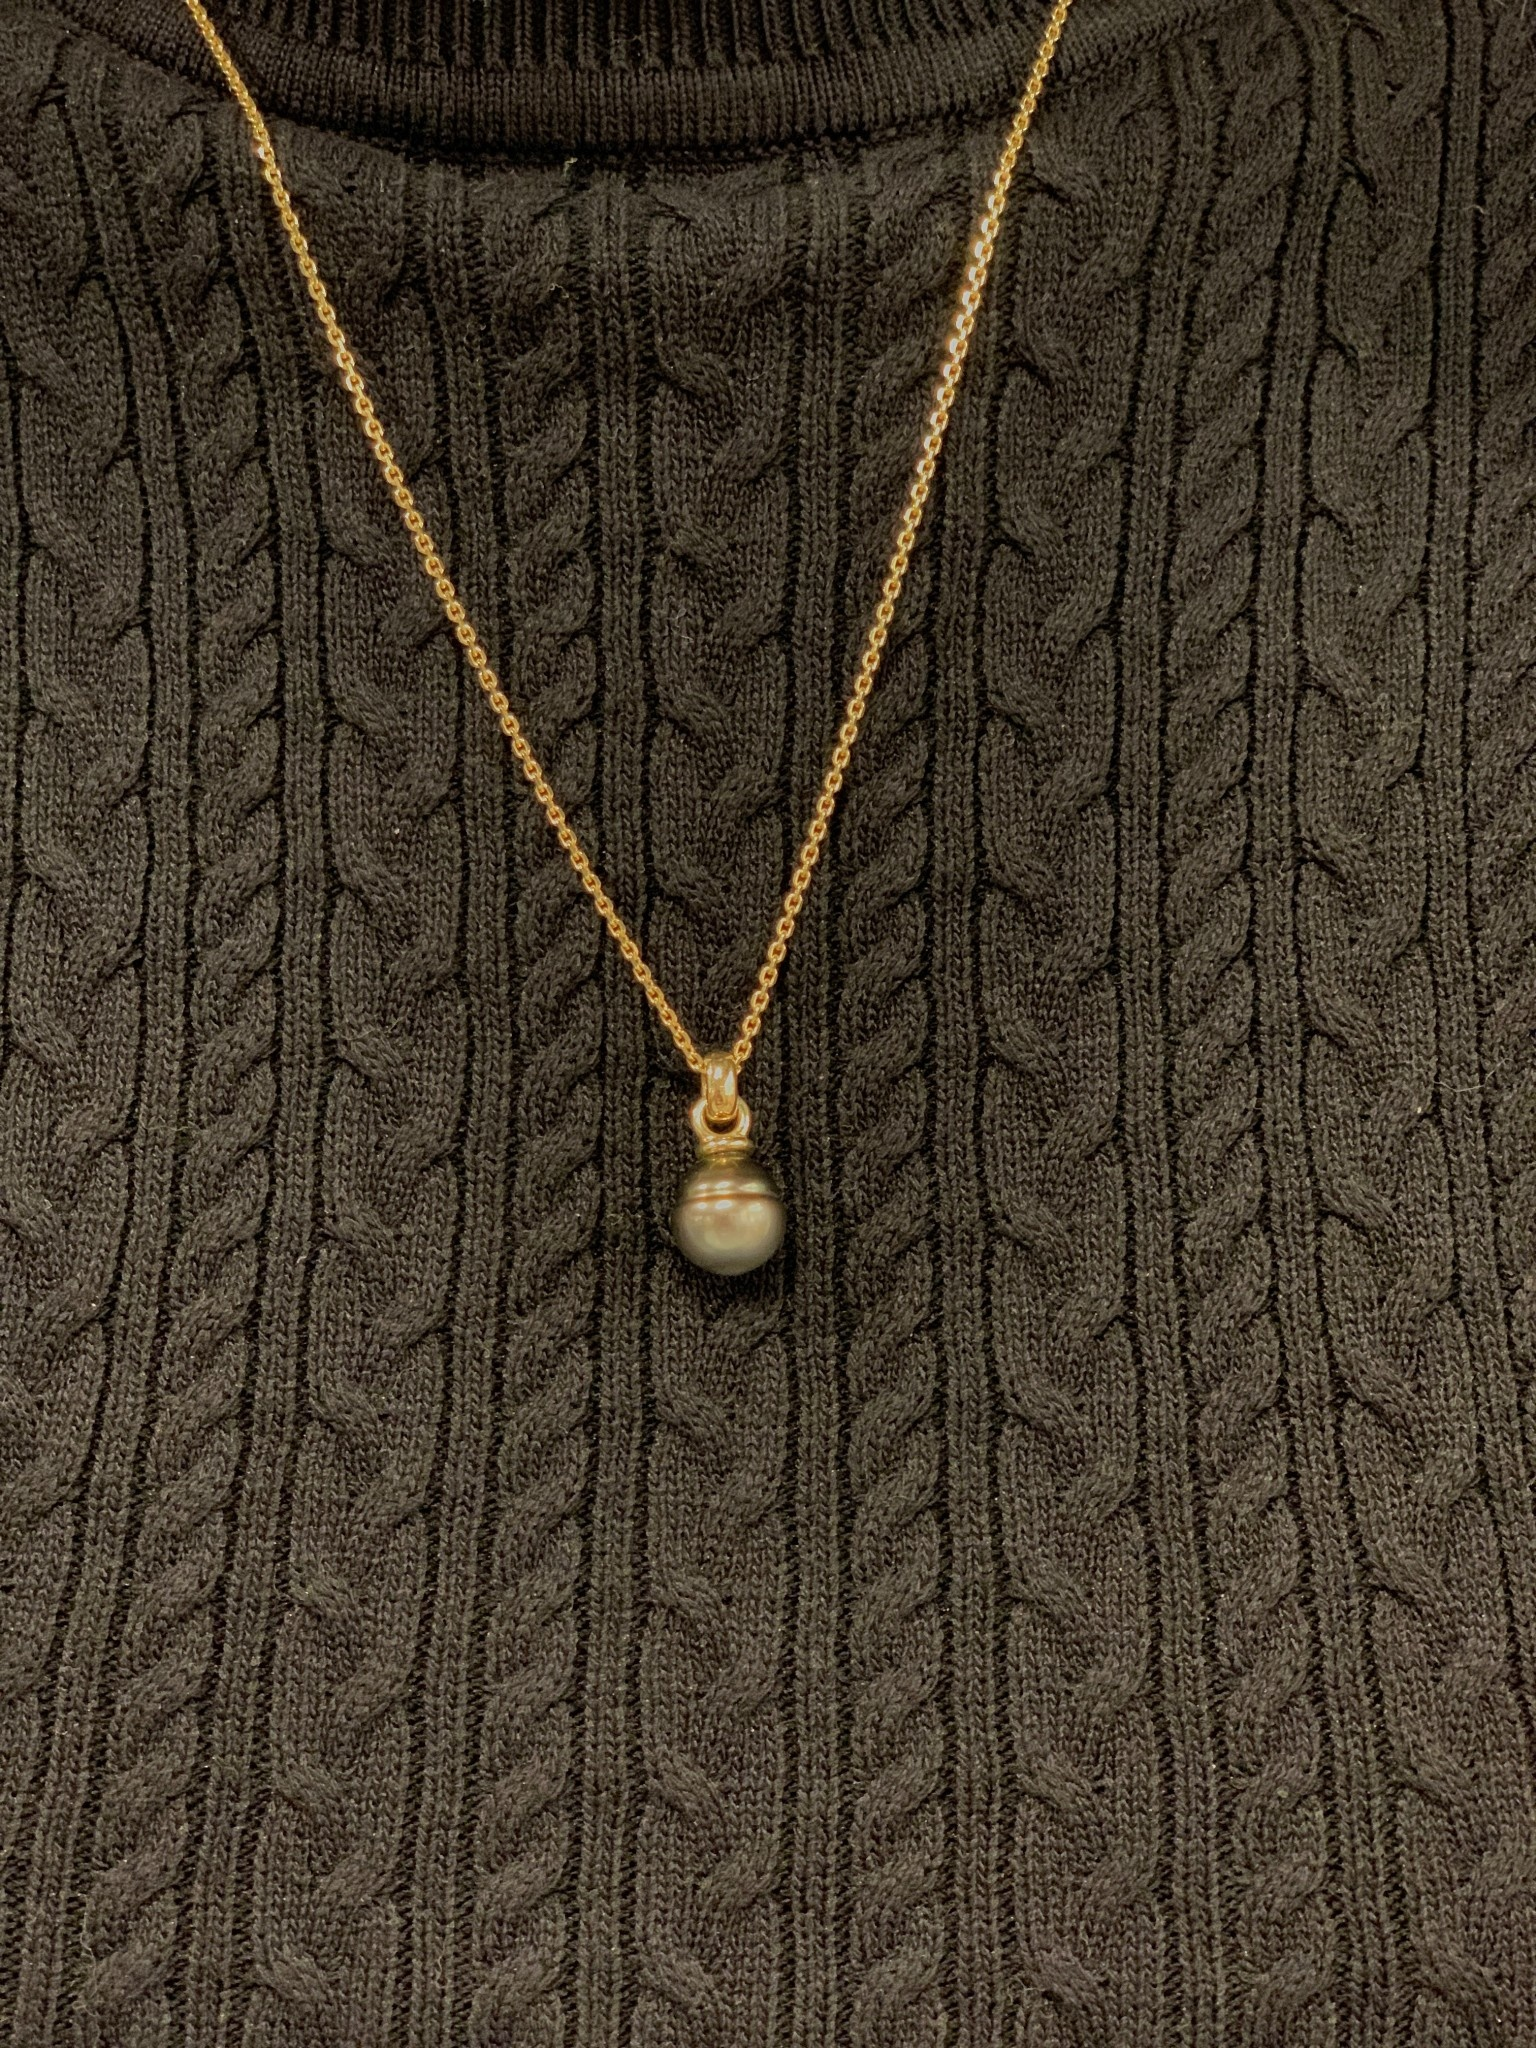 ROEMER by Bregje ROEMER by Bregje gouden hanger met grijze Tahiti parel